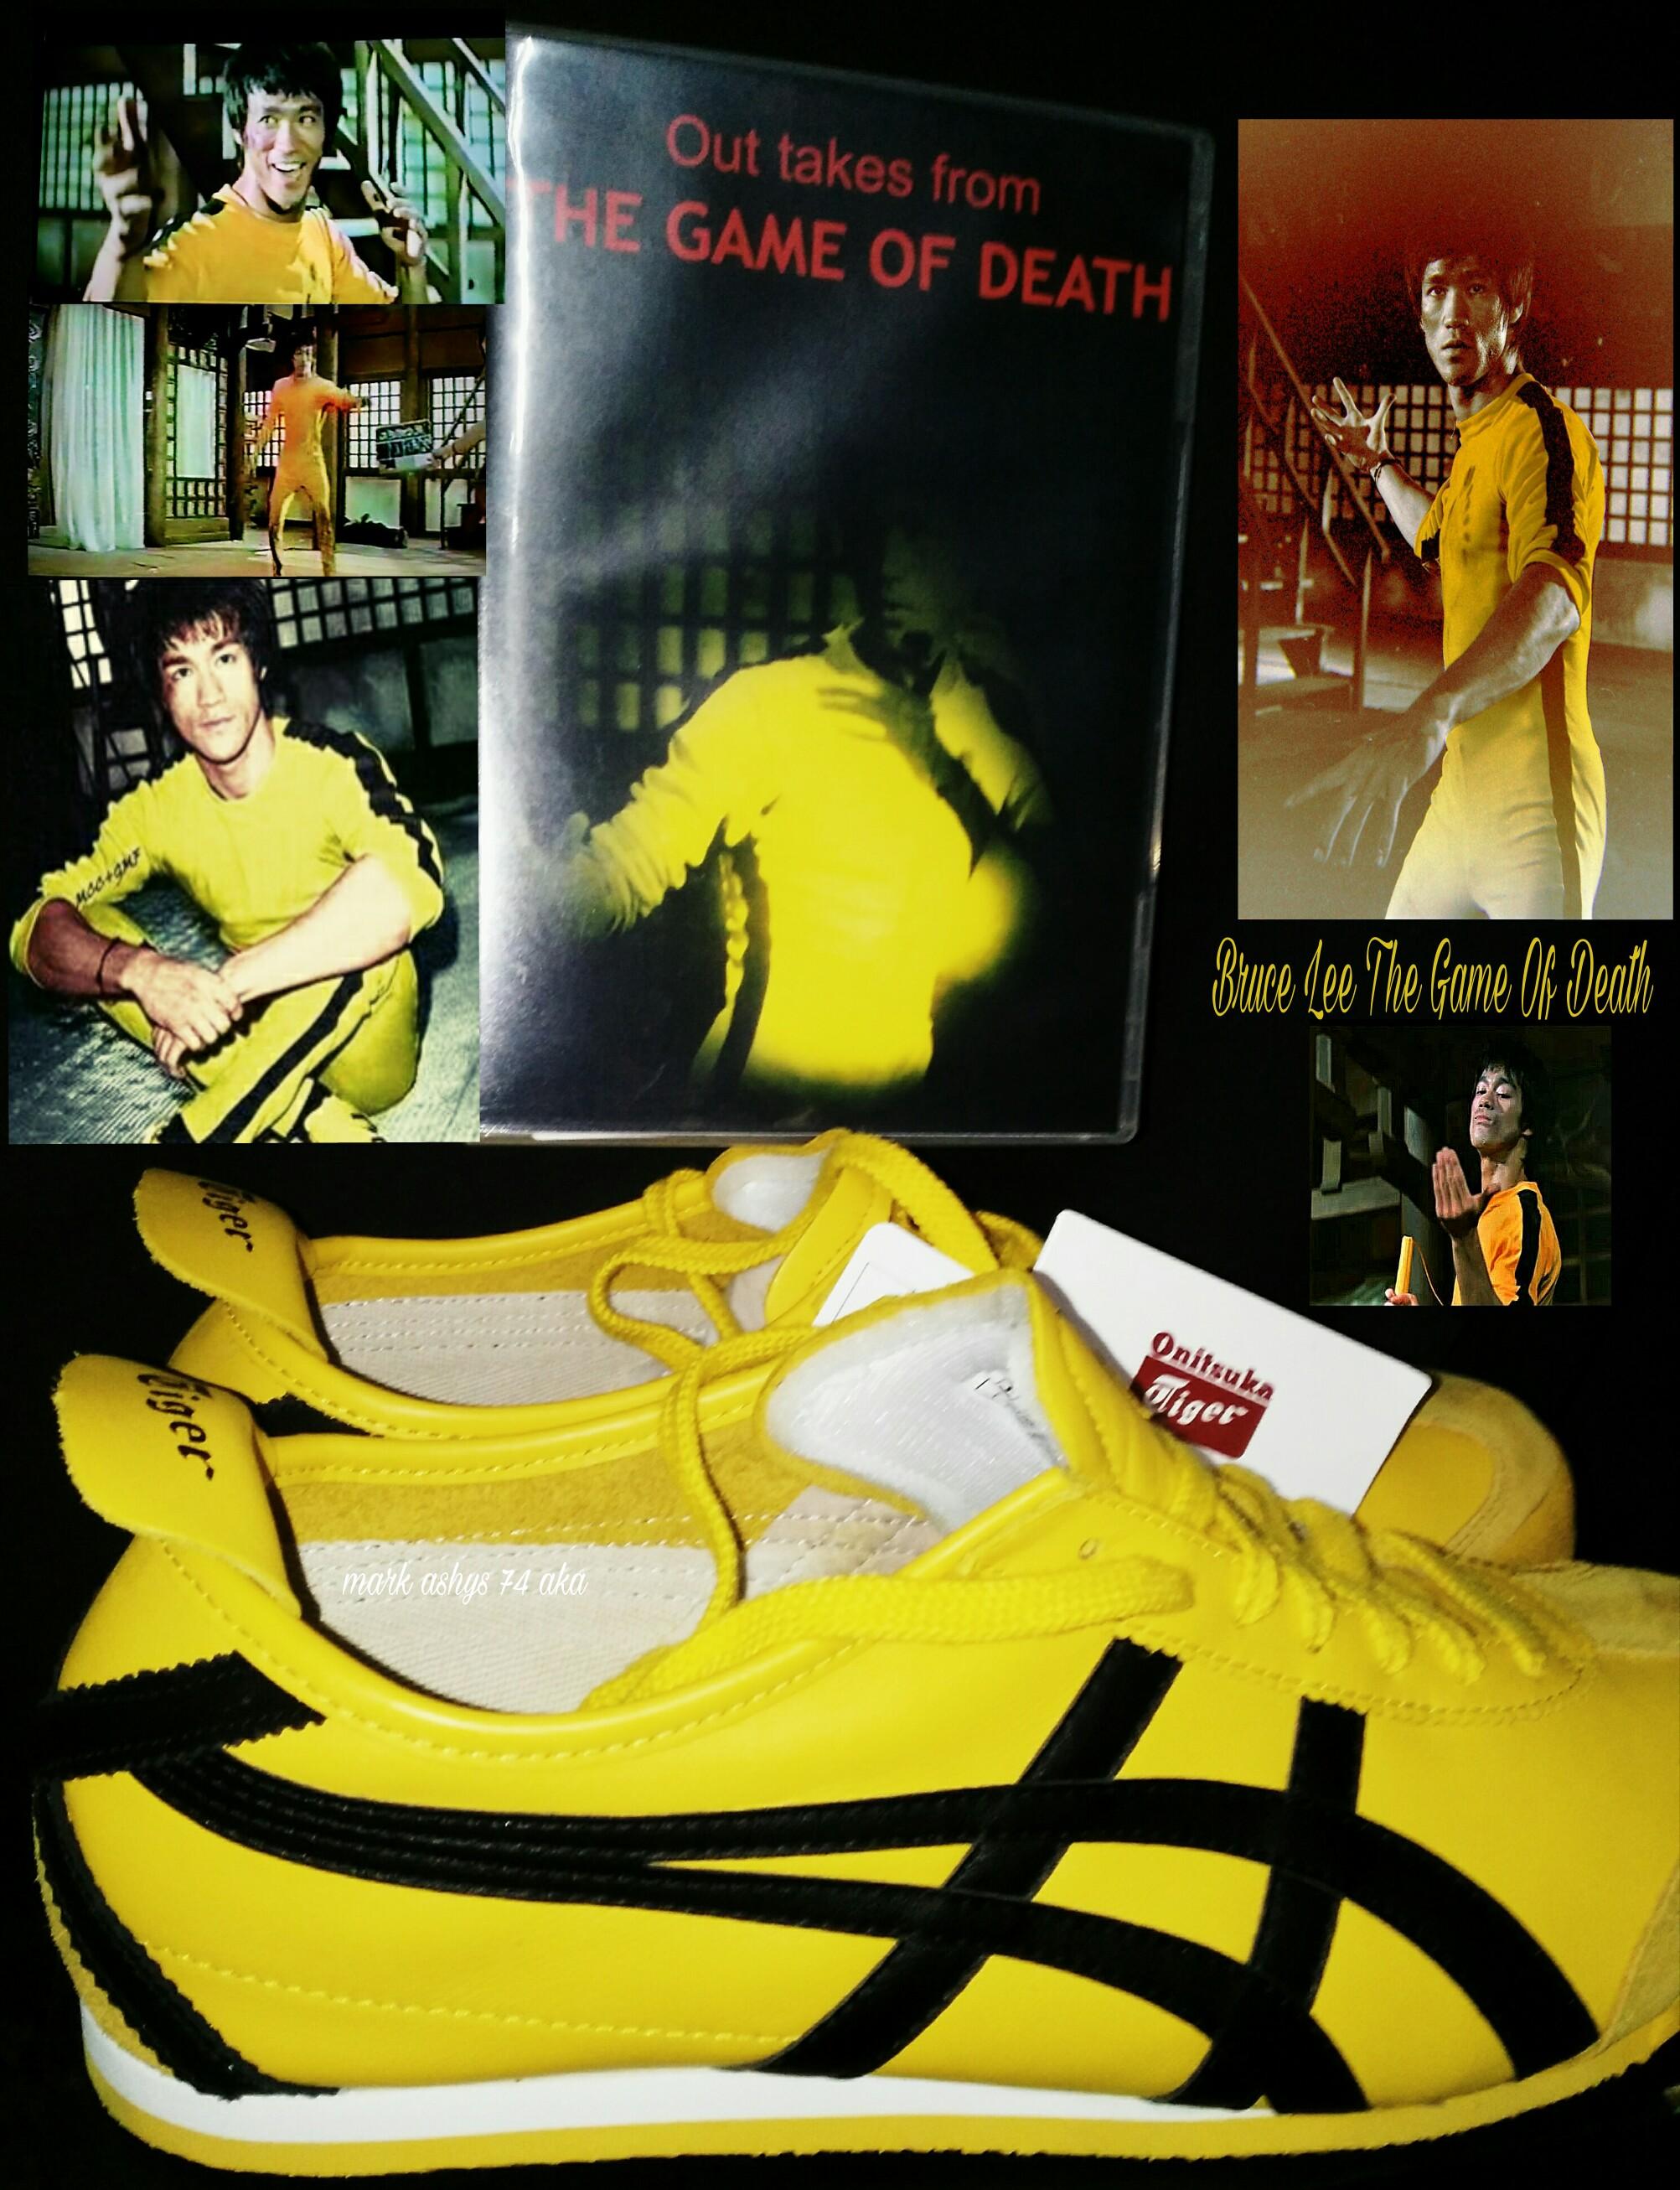 quality design e968e 02e13 Bruce Lee Game of Death outtakes onitsuka Tiger Mexico 66 ...